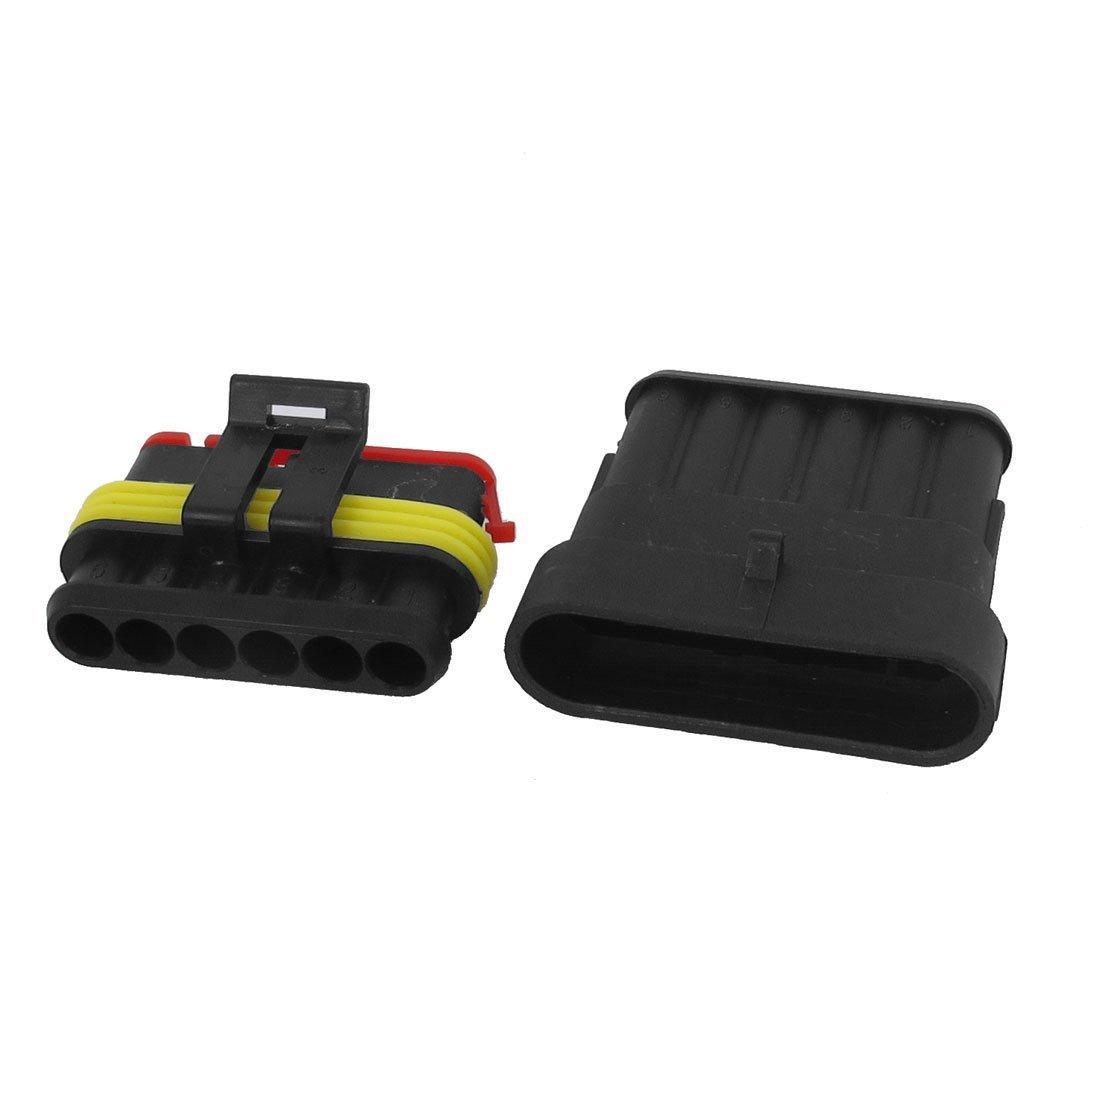 Amazon.com: Carro ATV UTV RV 6 Pin Waterproof Kit Connector ...